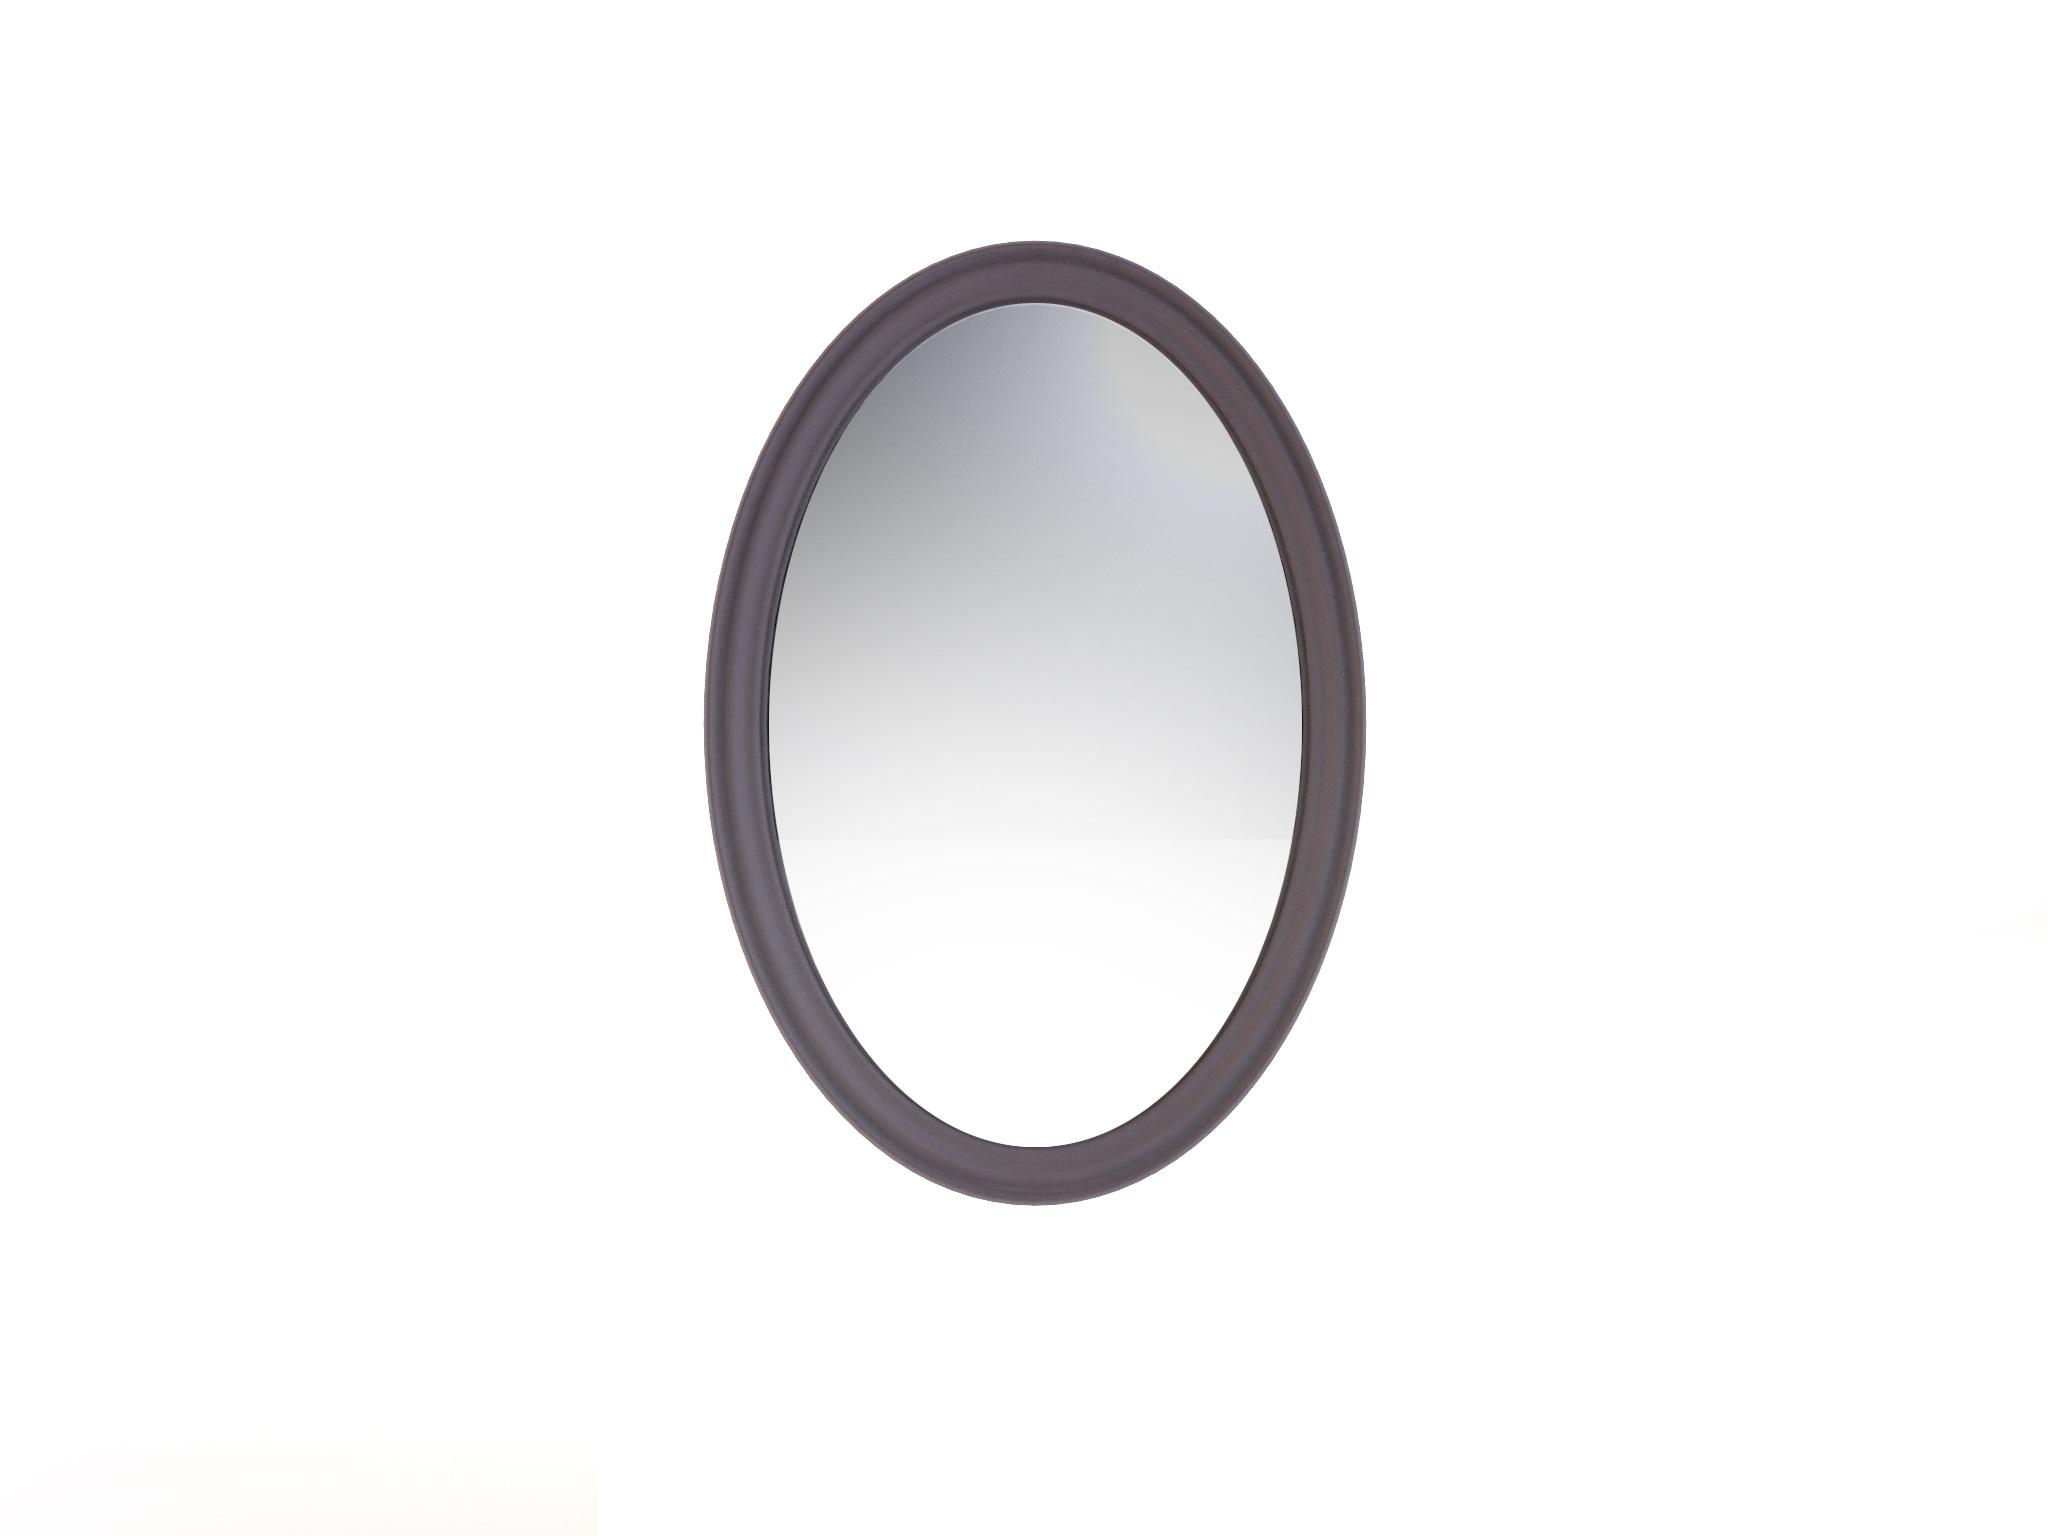 Зеркало Leontina lavandaНастенные зеркала<br>Вес: 5  кг.<br><br>Material: Береза<br>Width см: 55<br>Depth см: 3<br>Height см: 80